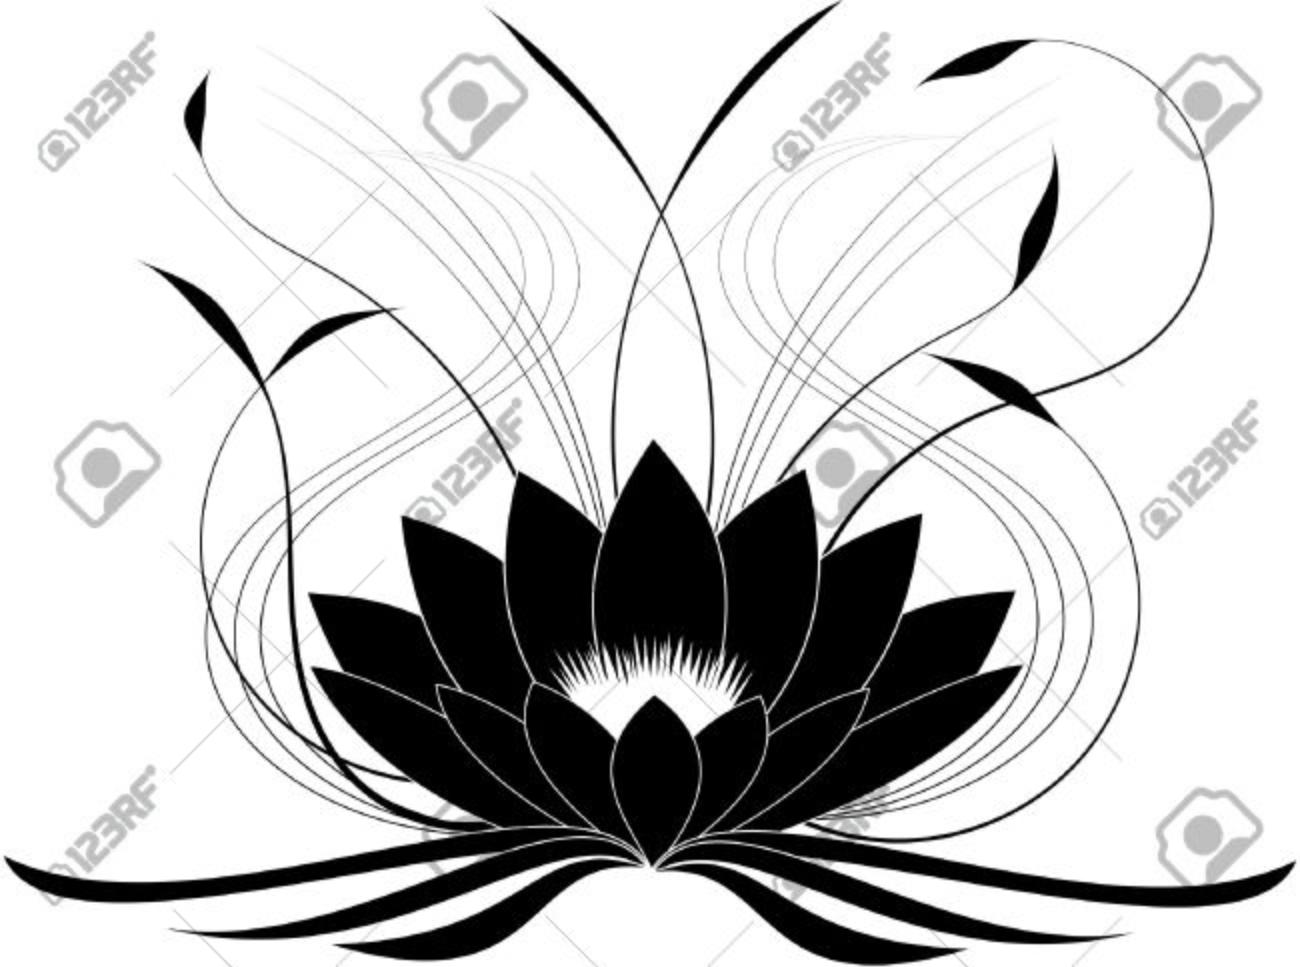 Black japanese lotus (vector illustration) Stock Vector - 23240629